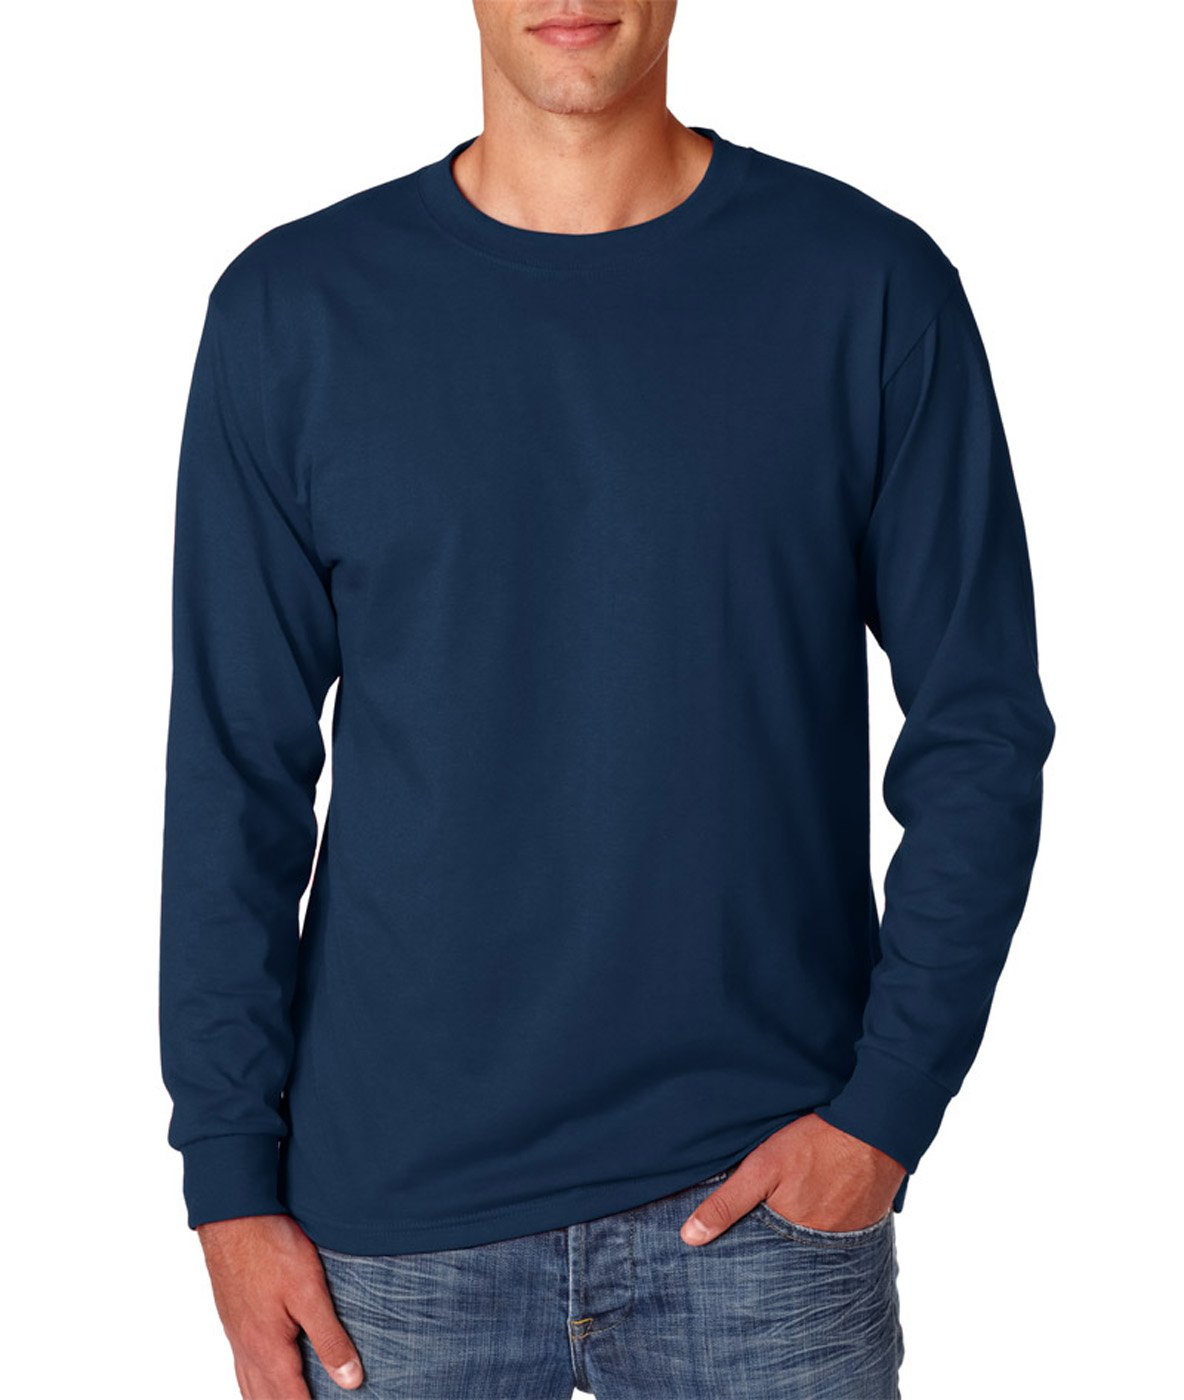 Jerzees Men's Adult Long Sleeve Tee, Navy, Large